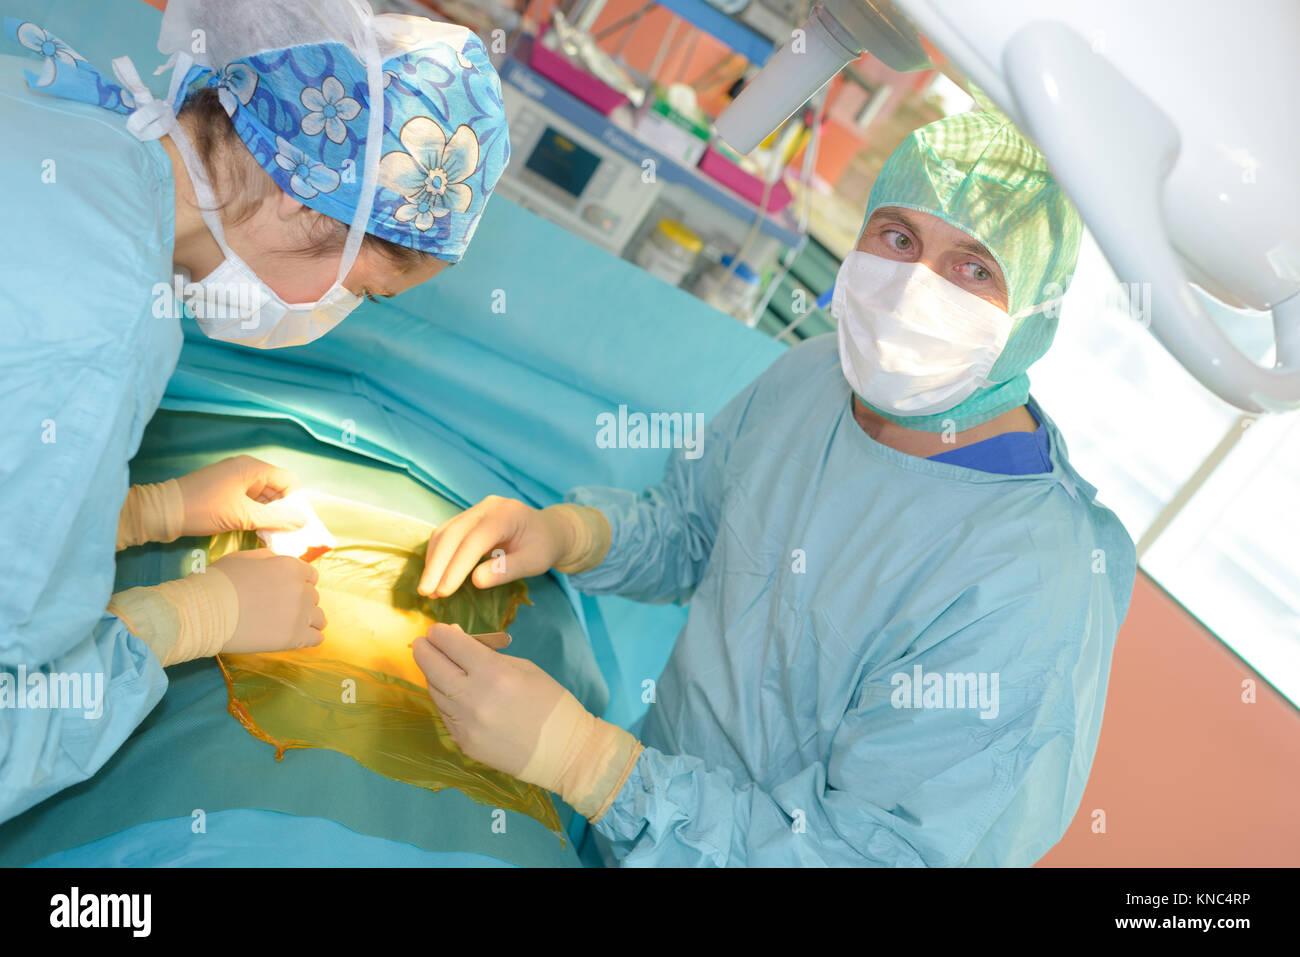 veterinarian surgeons in operating room - Stock Image